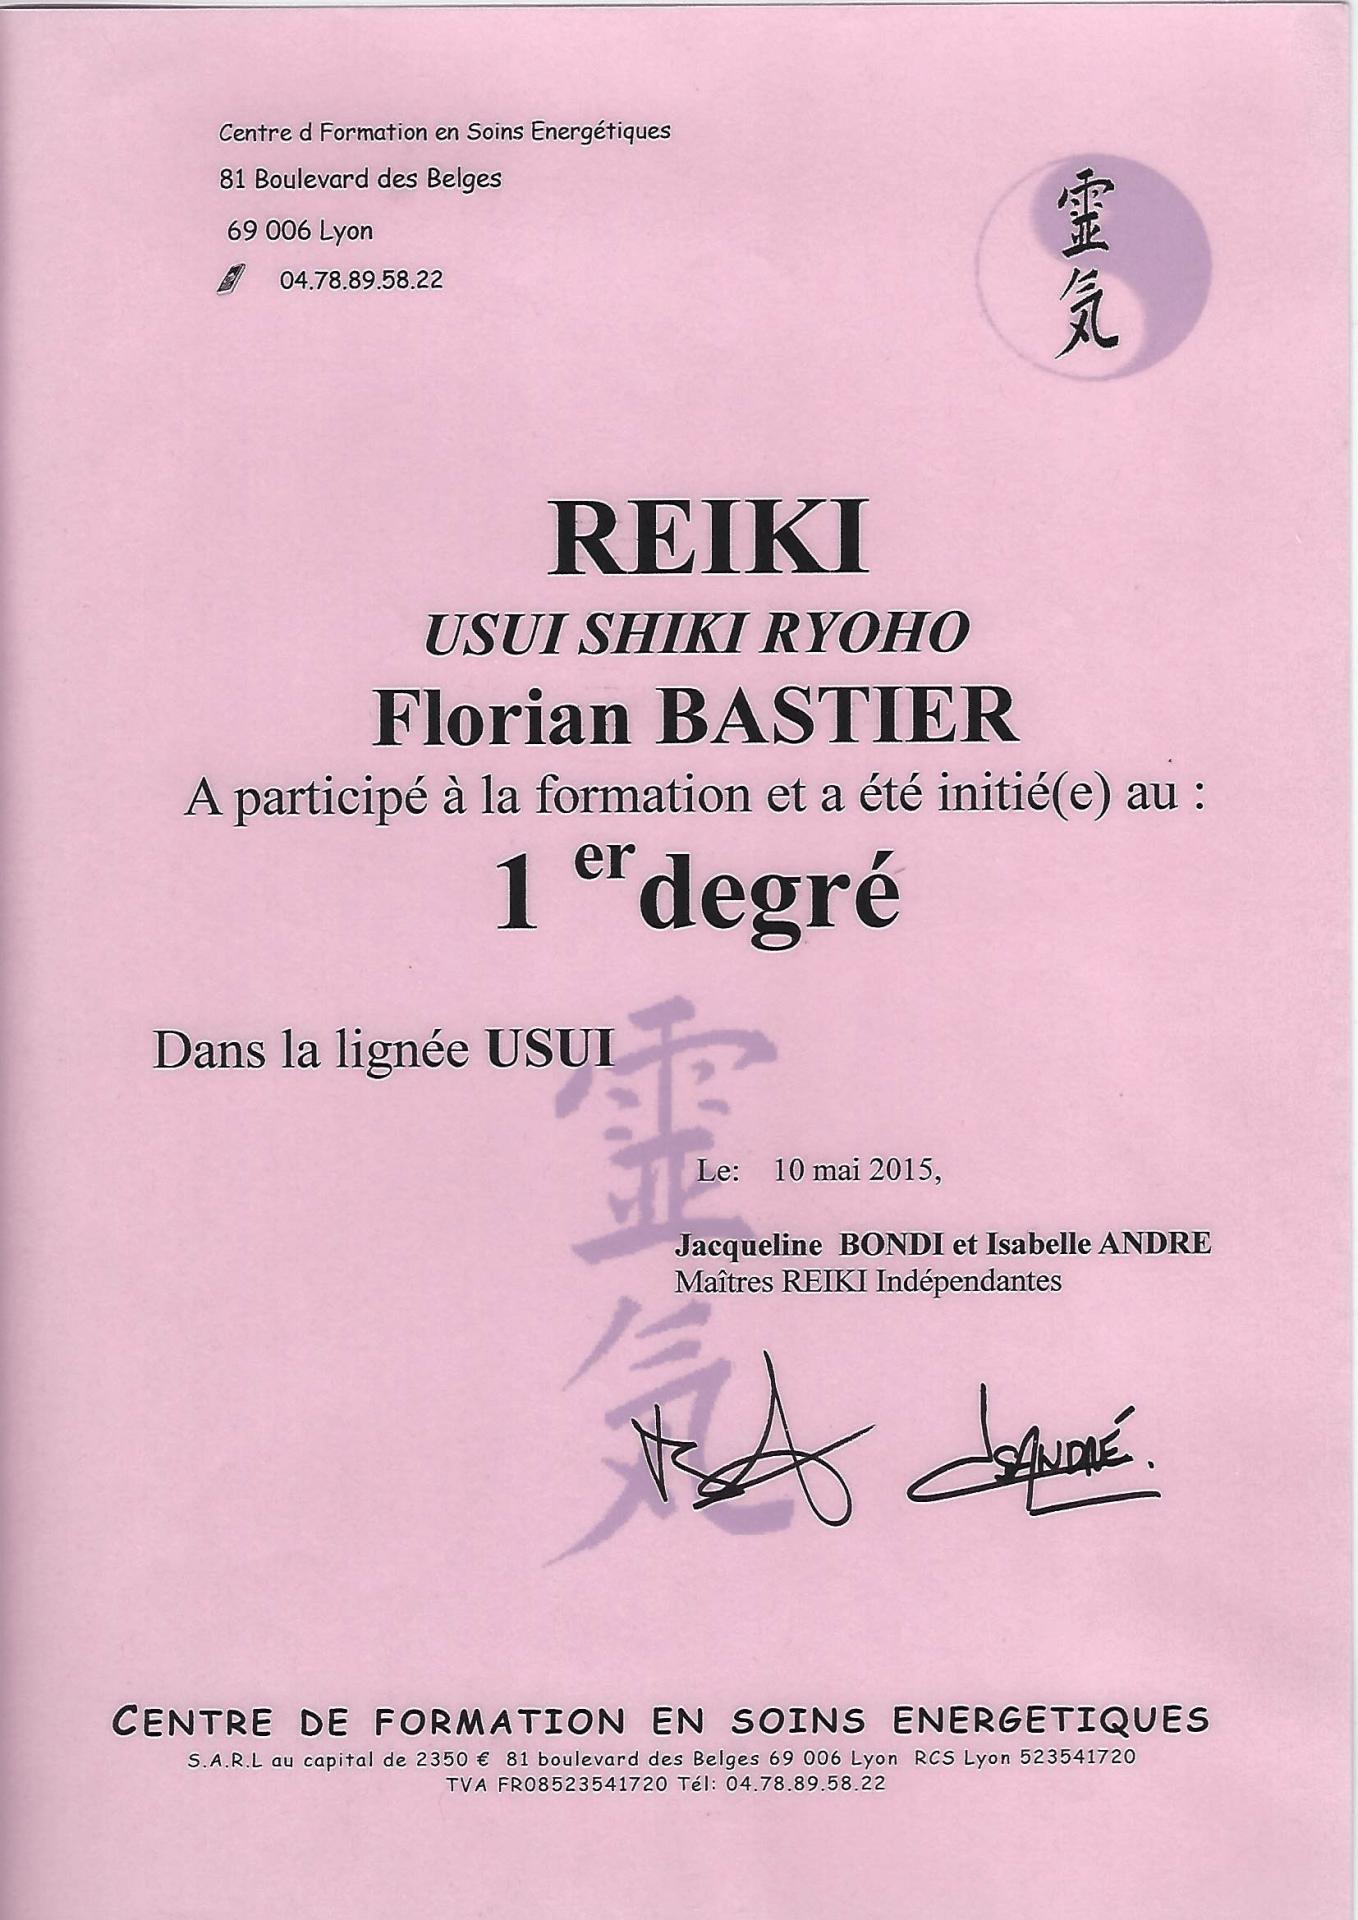 Reiki 1er degré